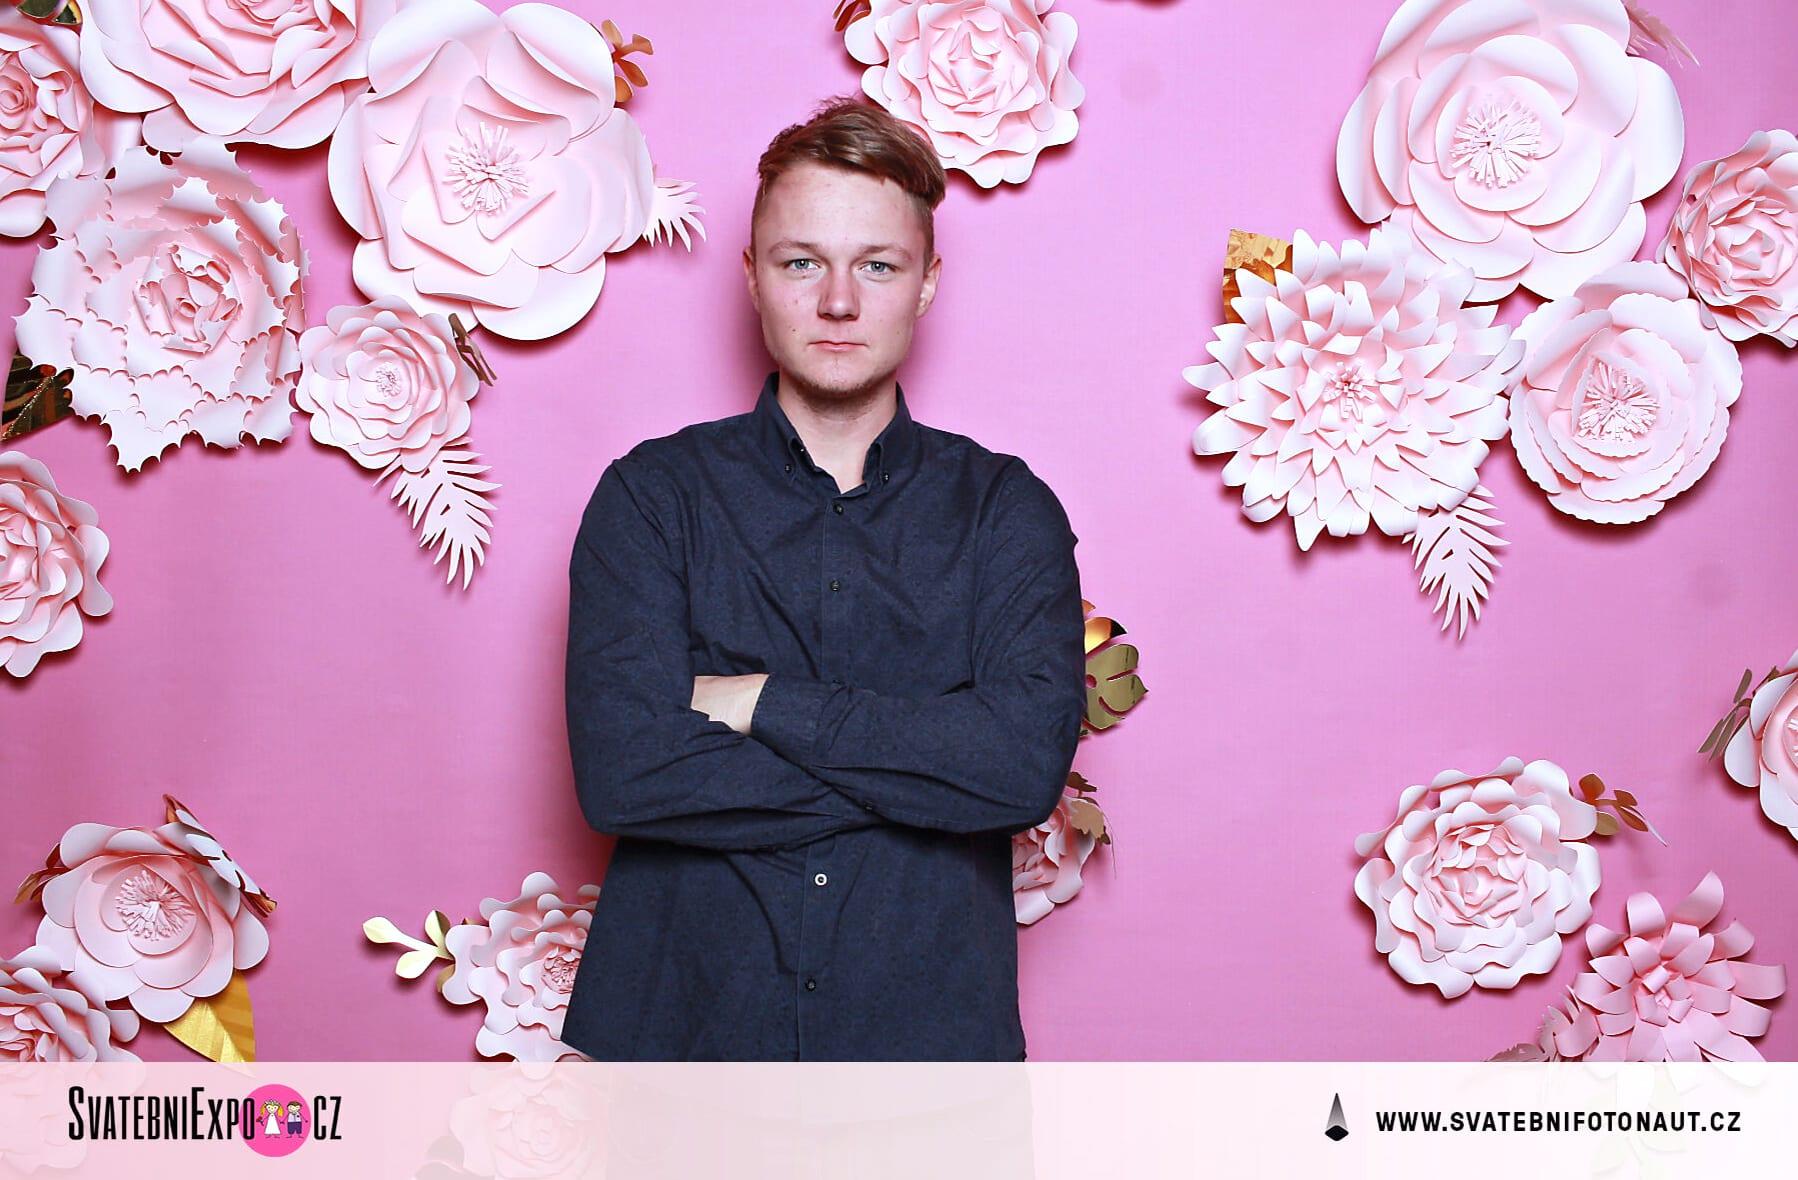 fotokoutek-praha-veletrh-svatebni-expo-15-11-2019-671174